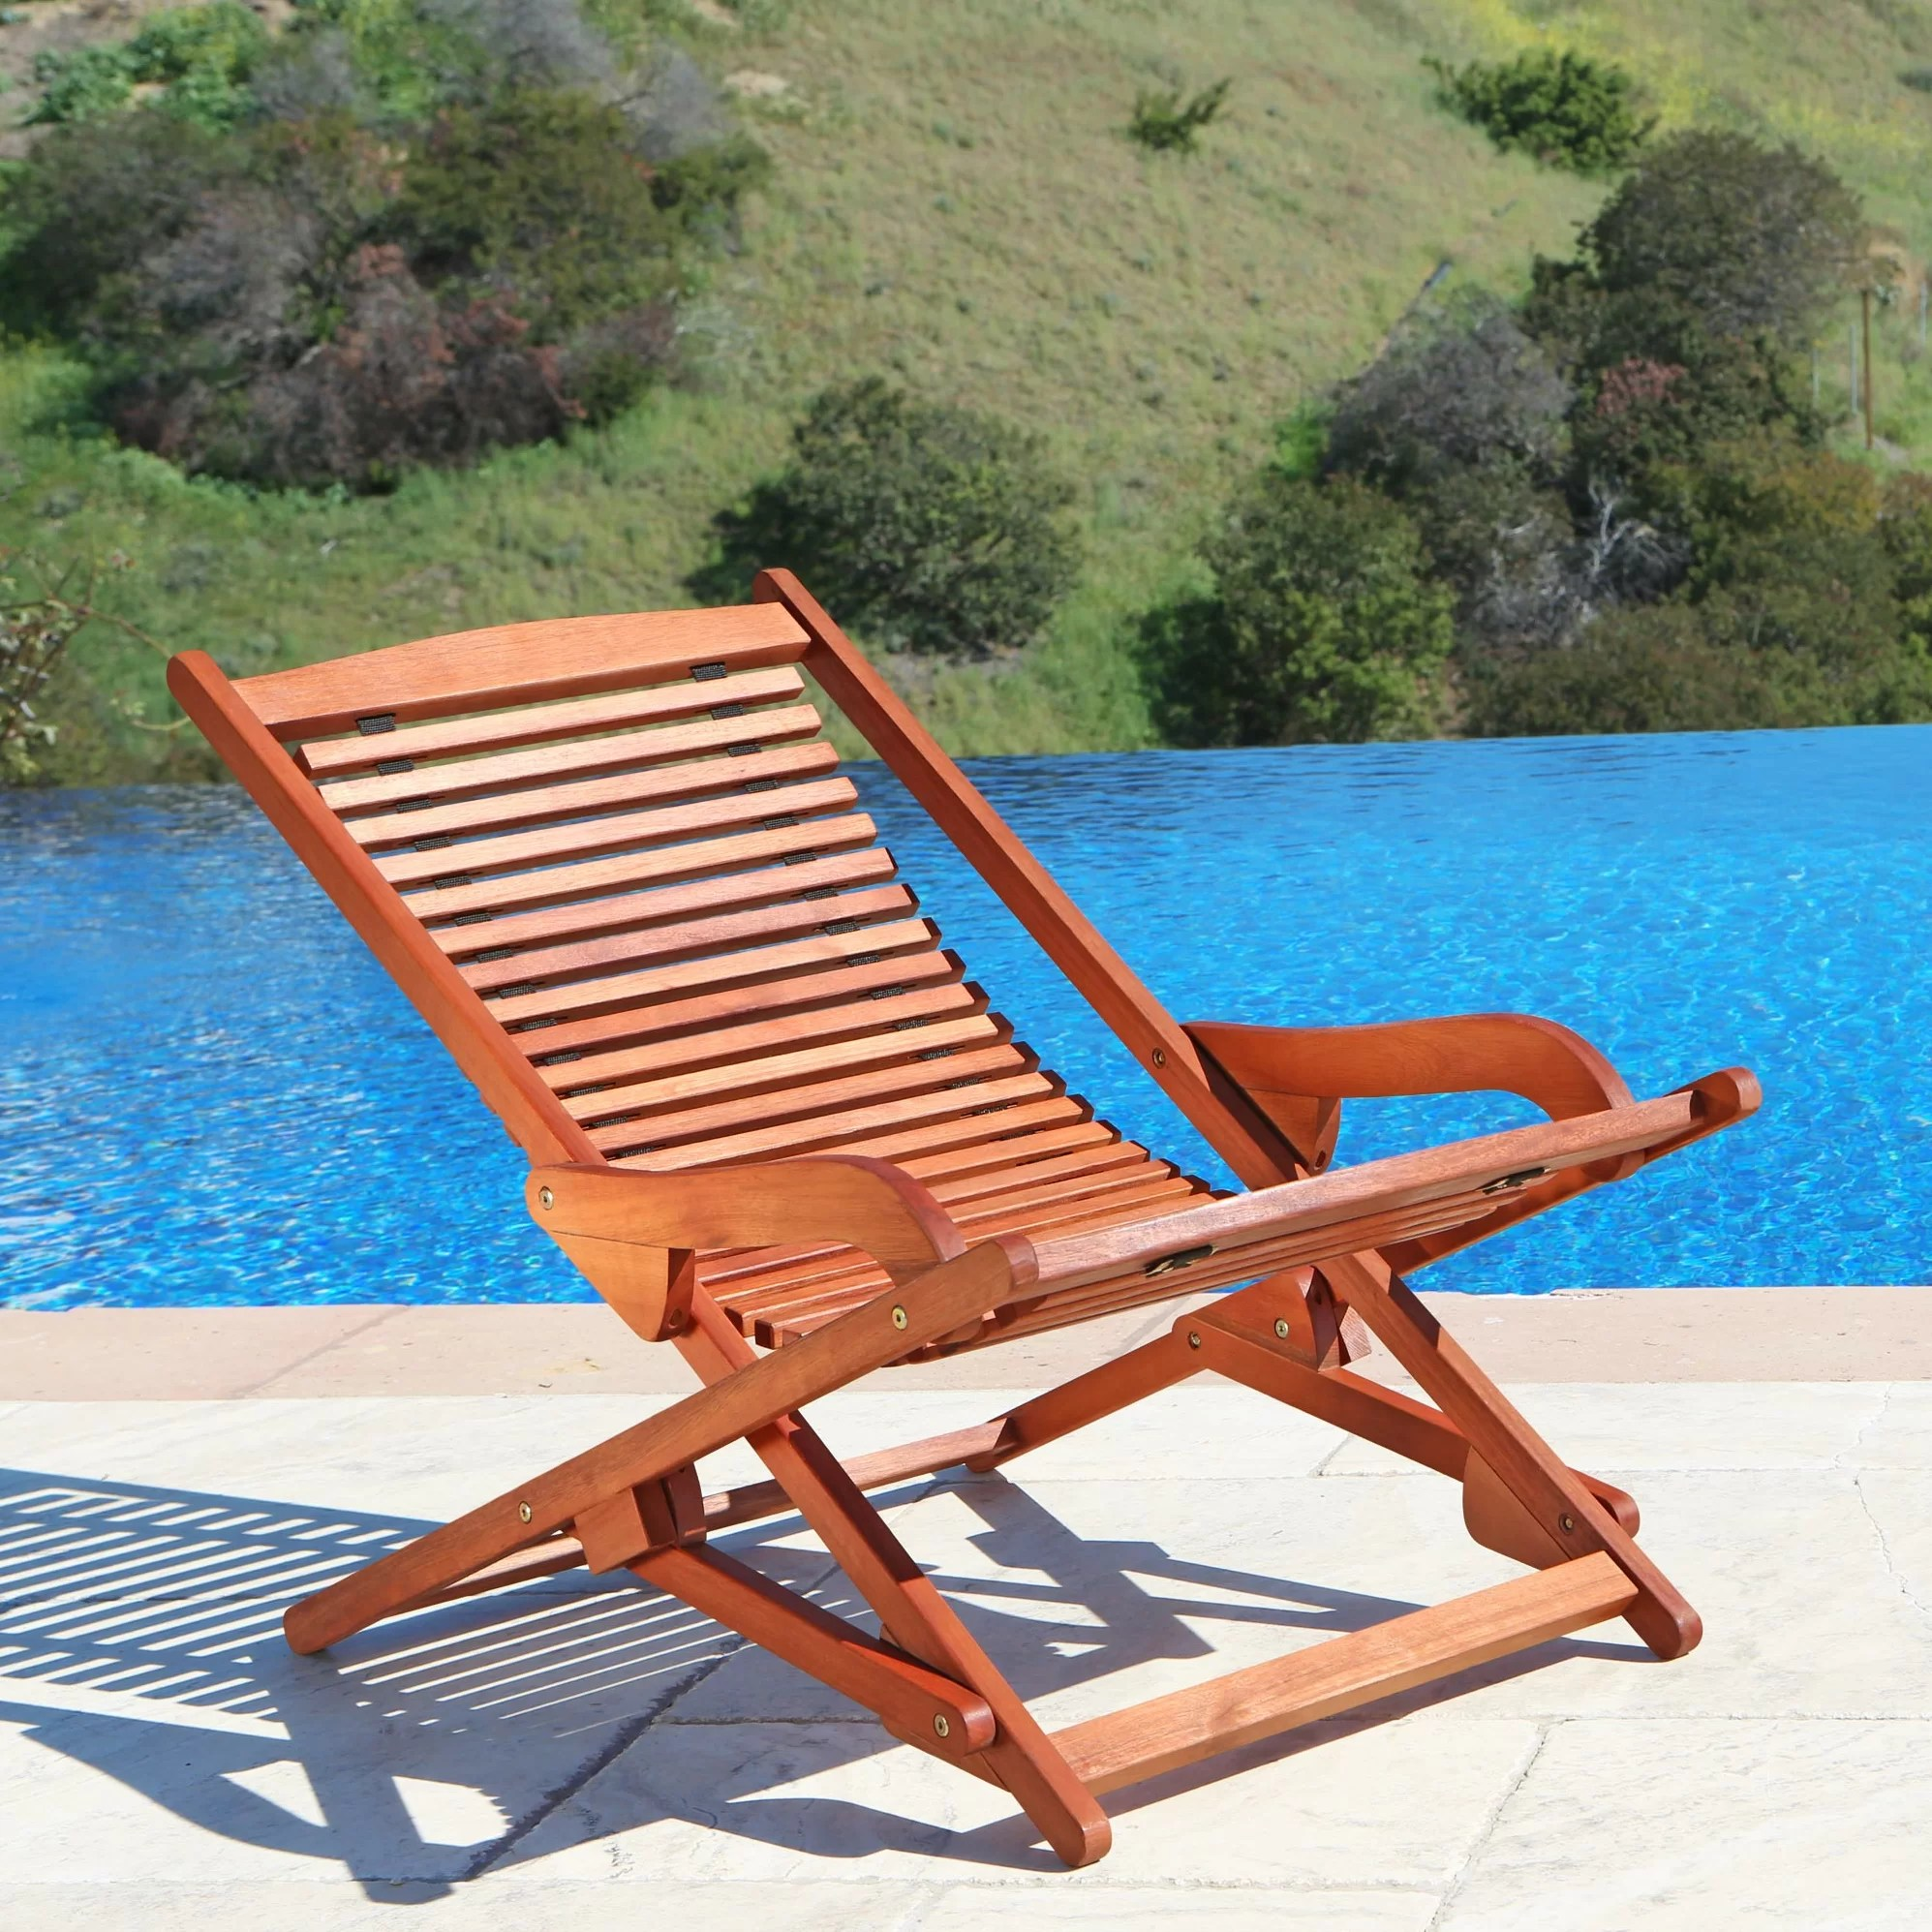 garden relaxer chair covers massage forum vifah outdoor zero gravity and reviews wayfair